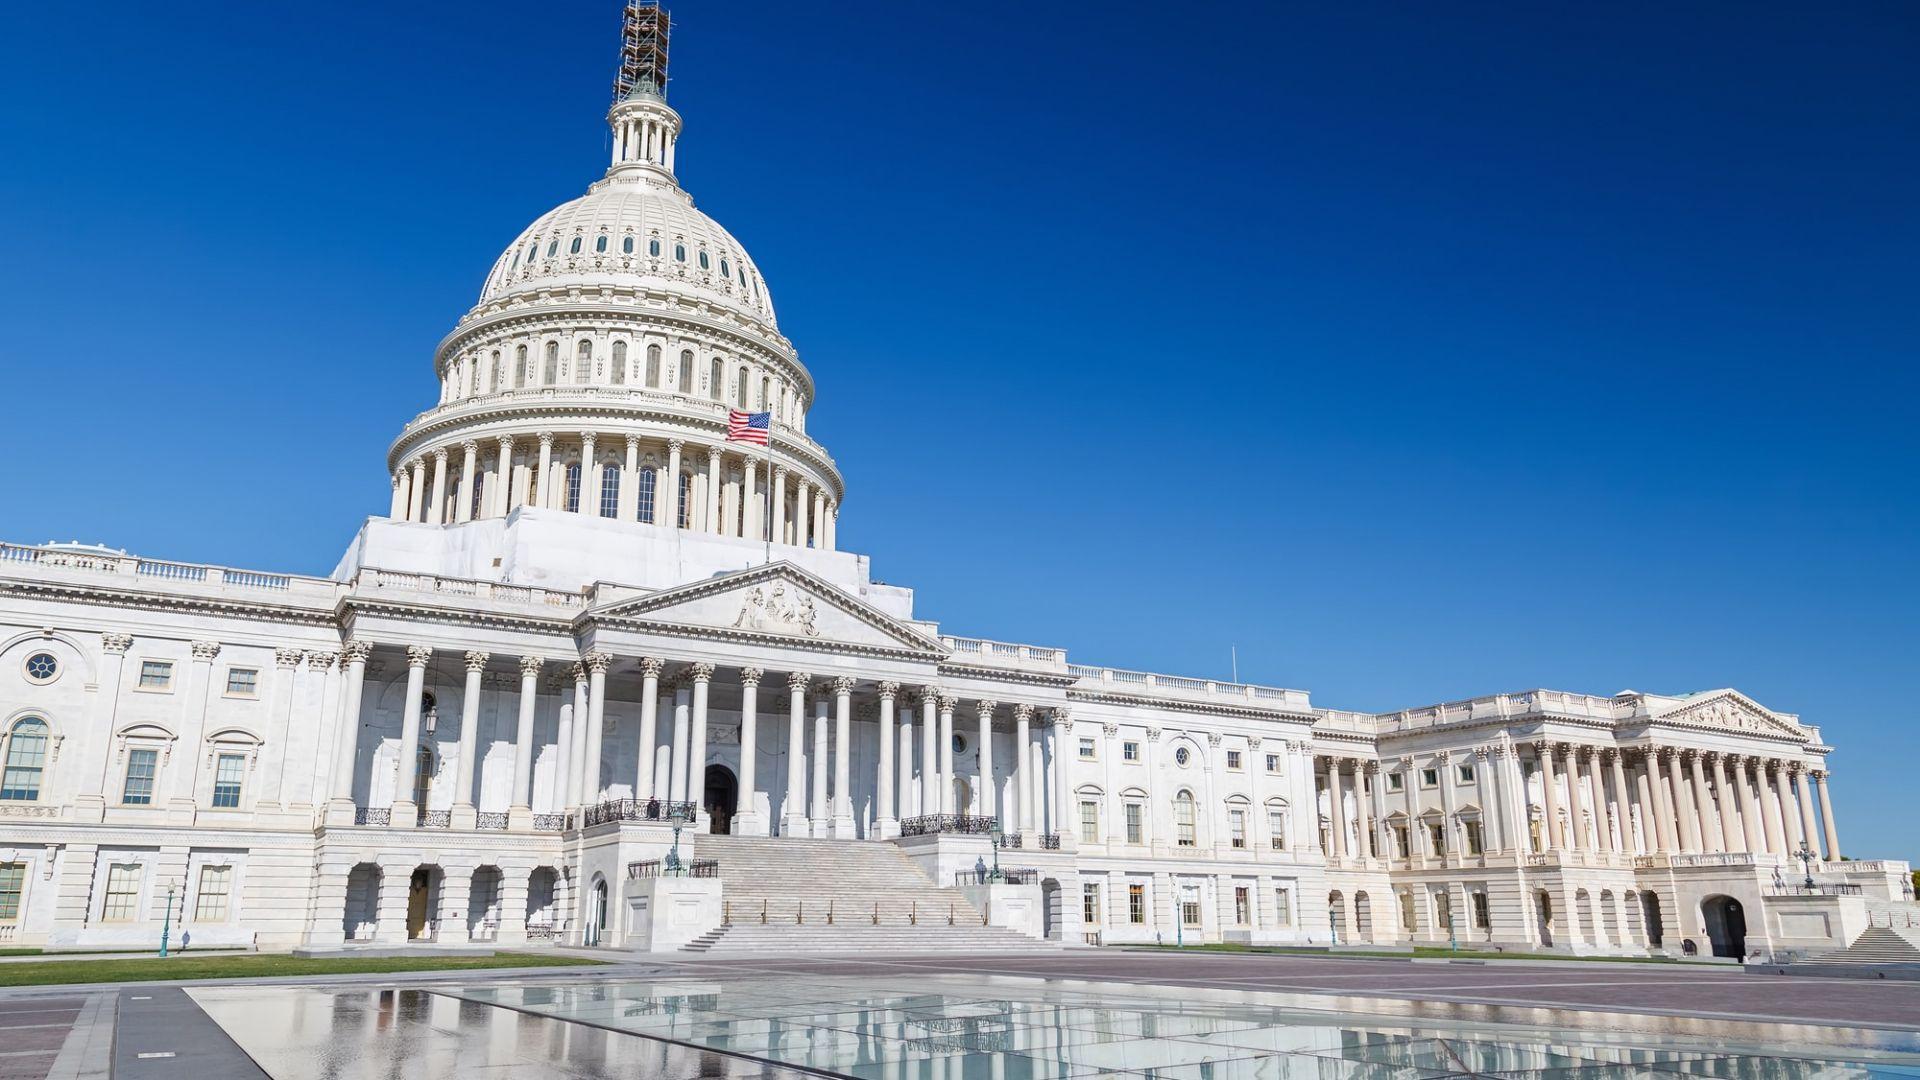 Prezidento būstinė - Vašingtono Baltieji rūmai